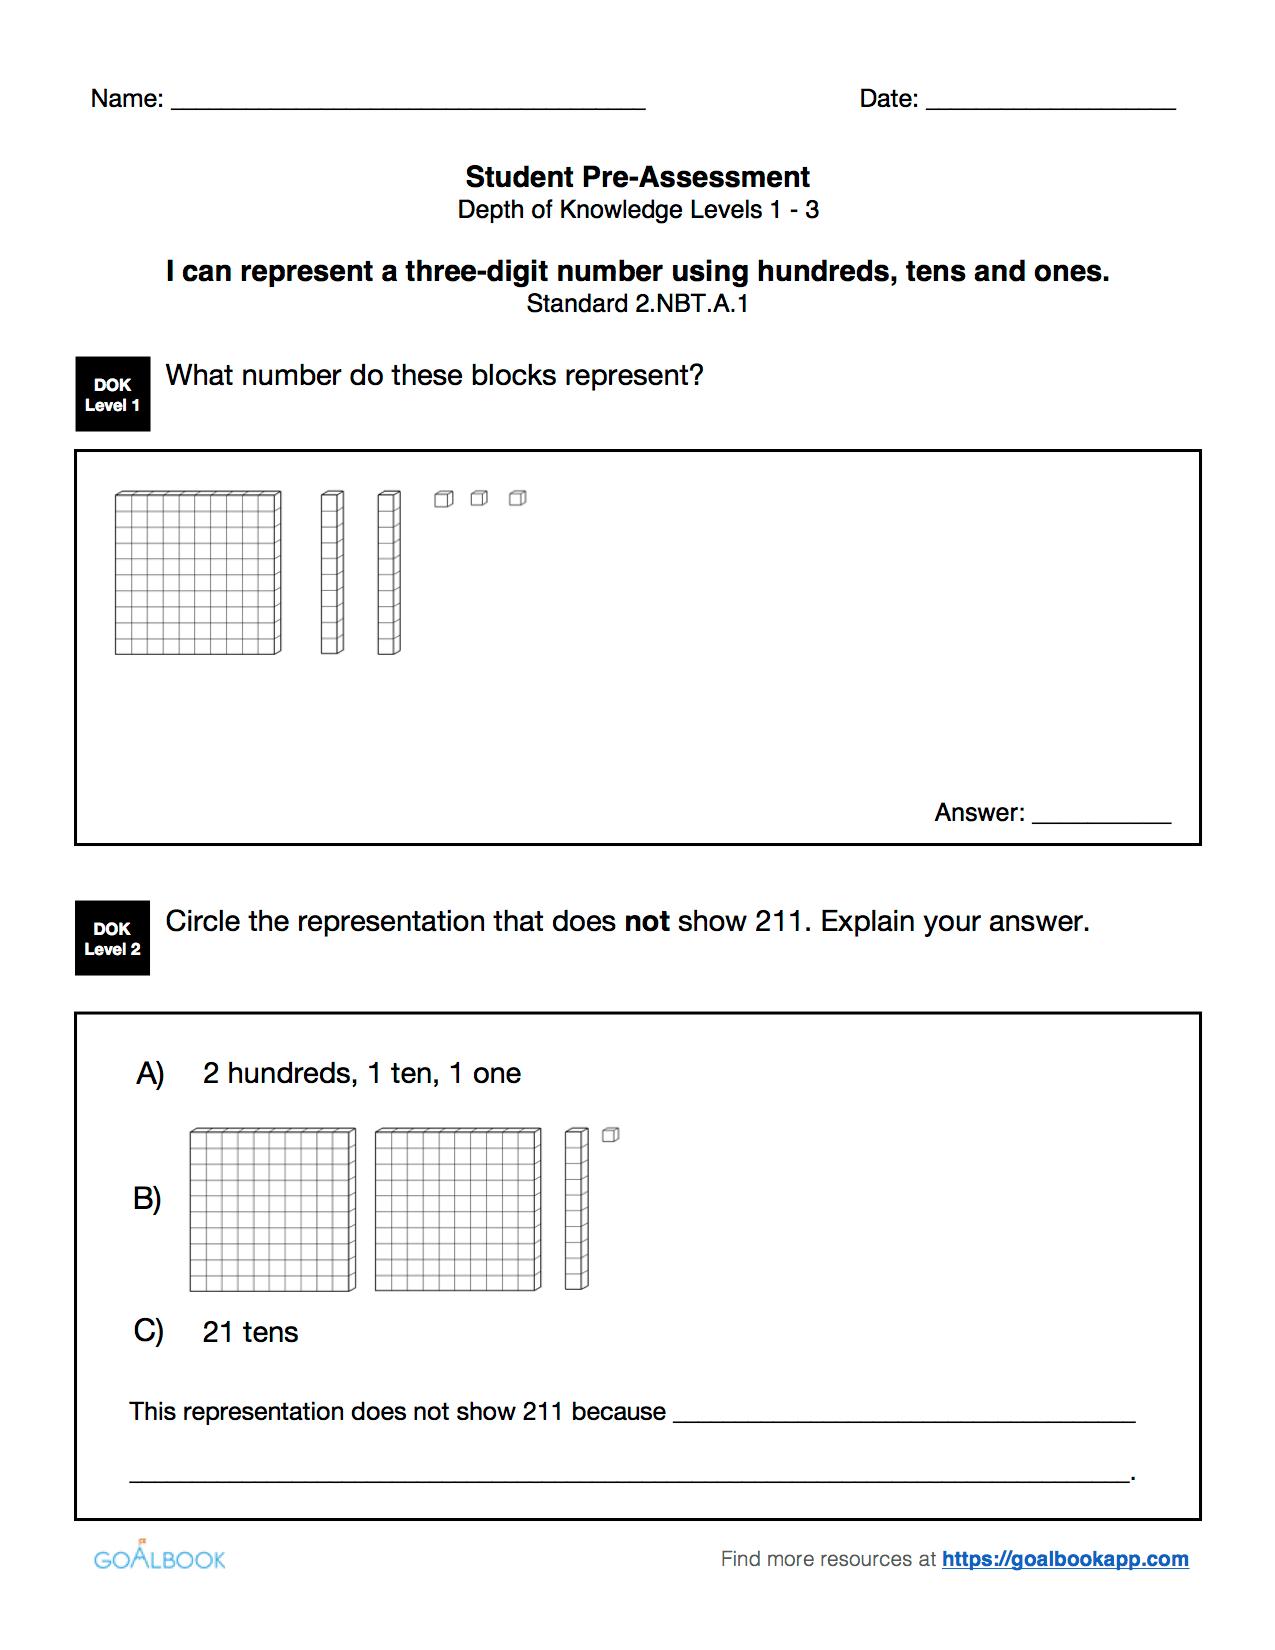 Quick Assessment Representing Three Digit Numbers